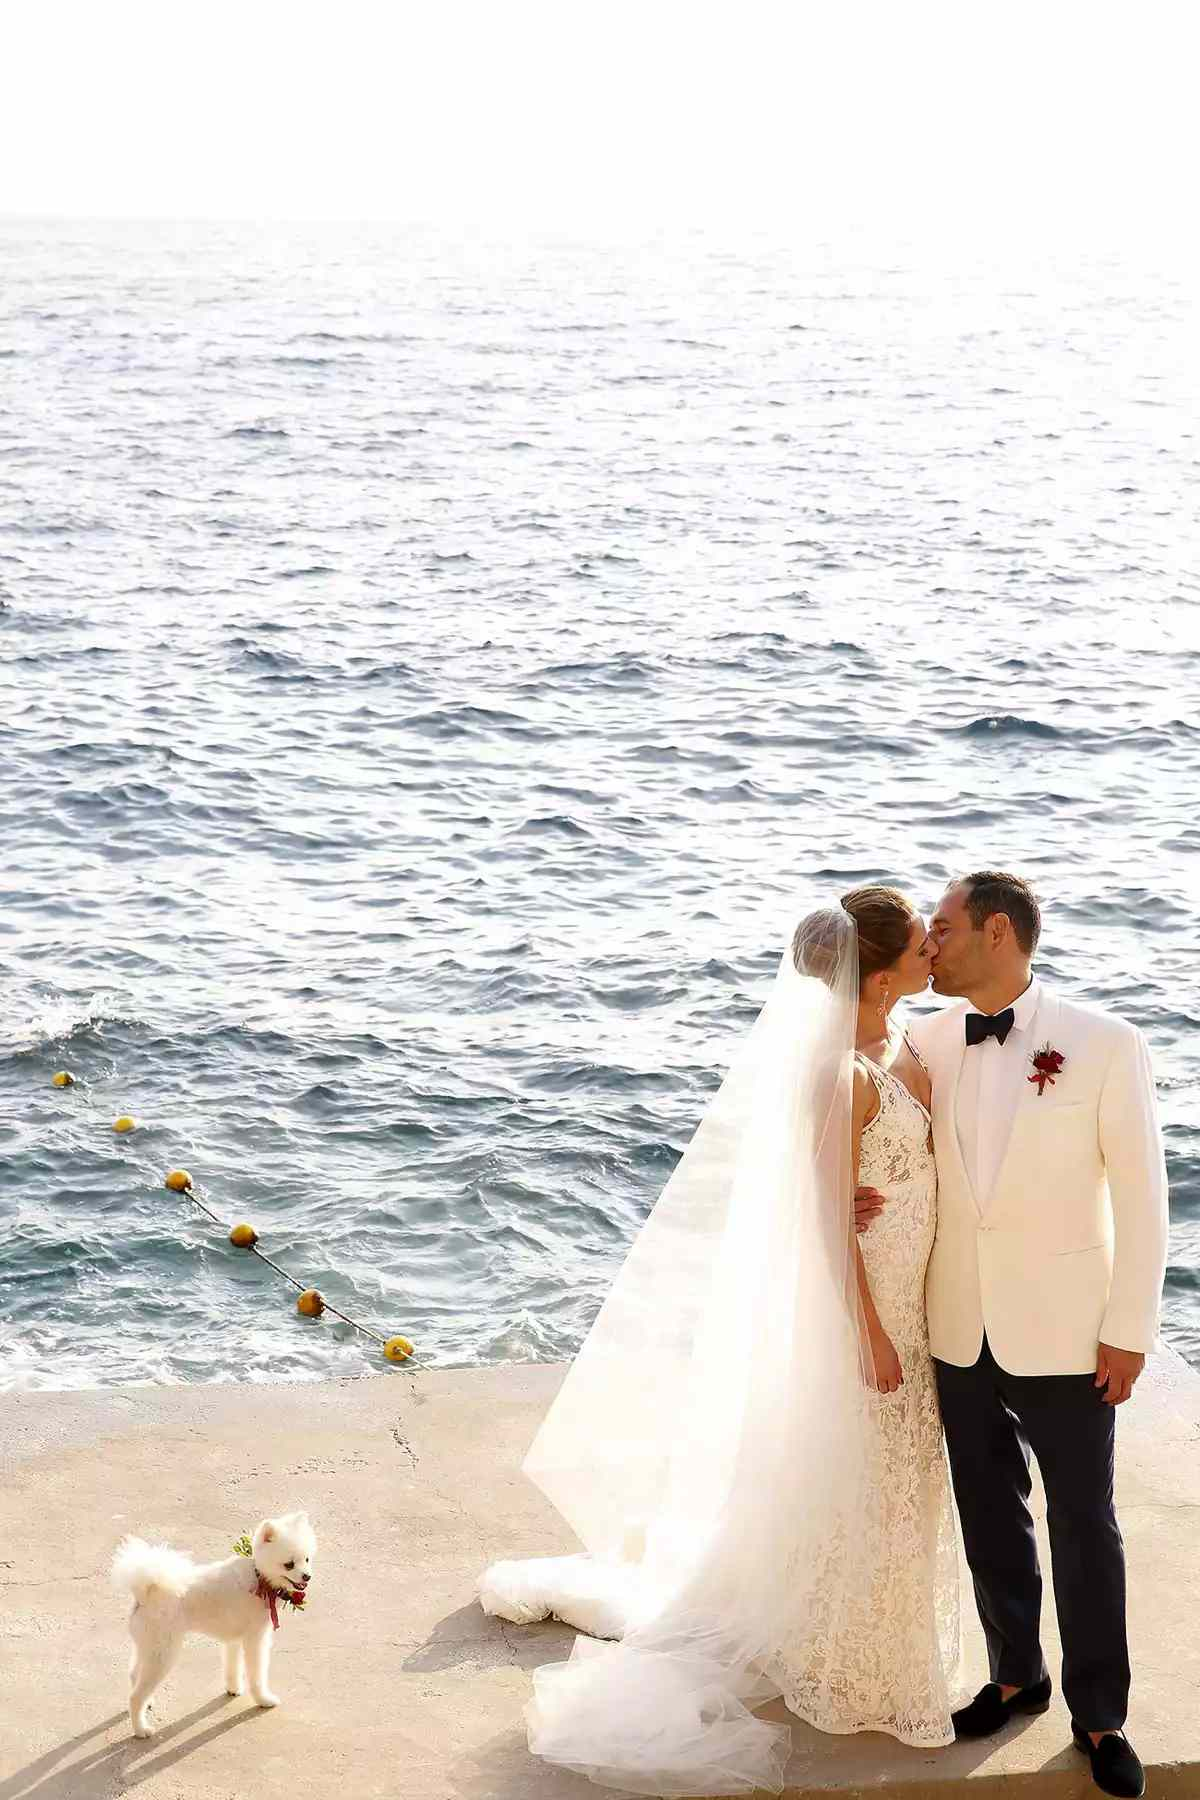 Dubrovnik, Croatia wedding